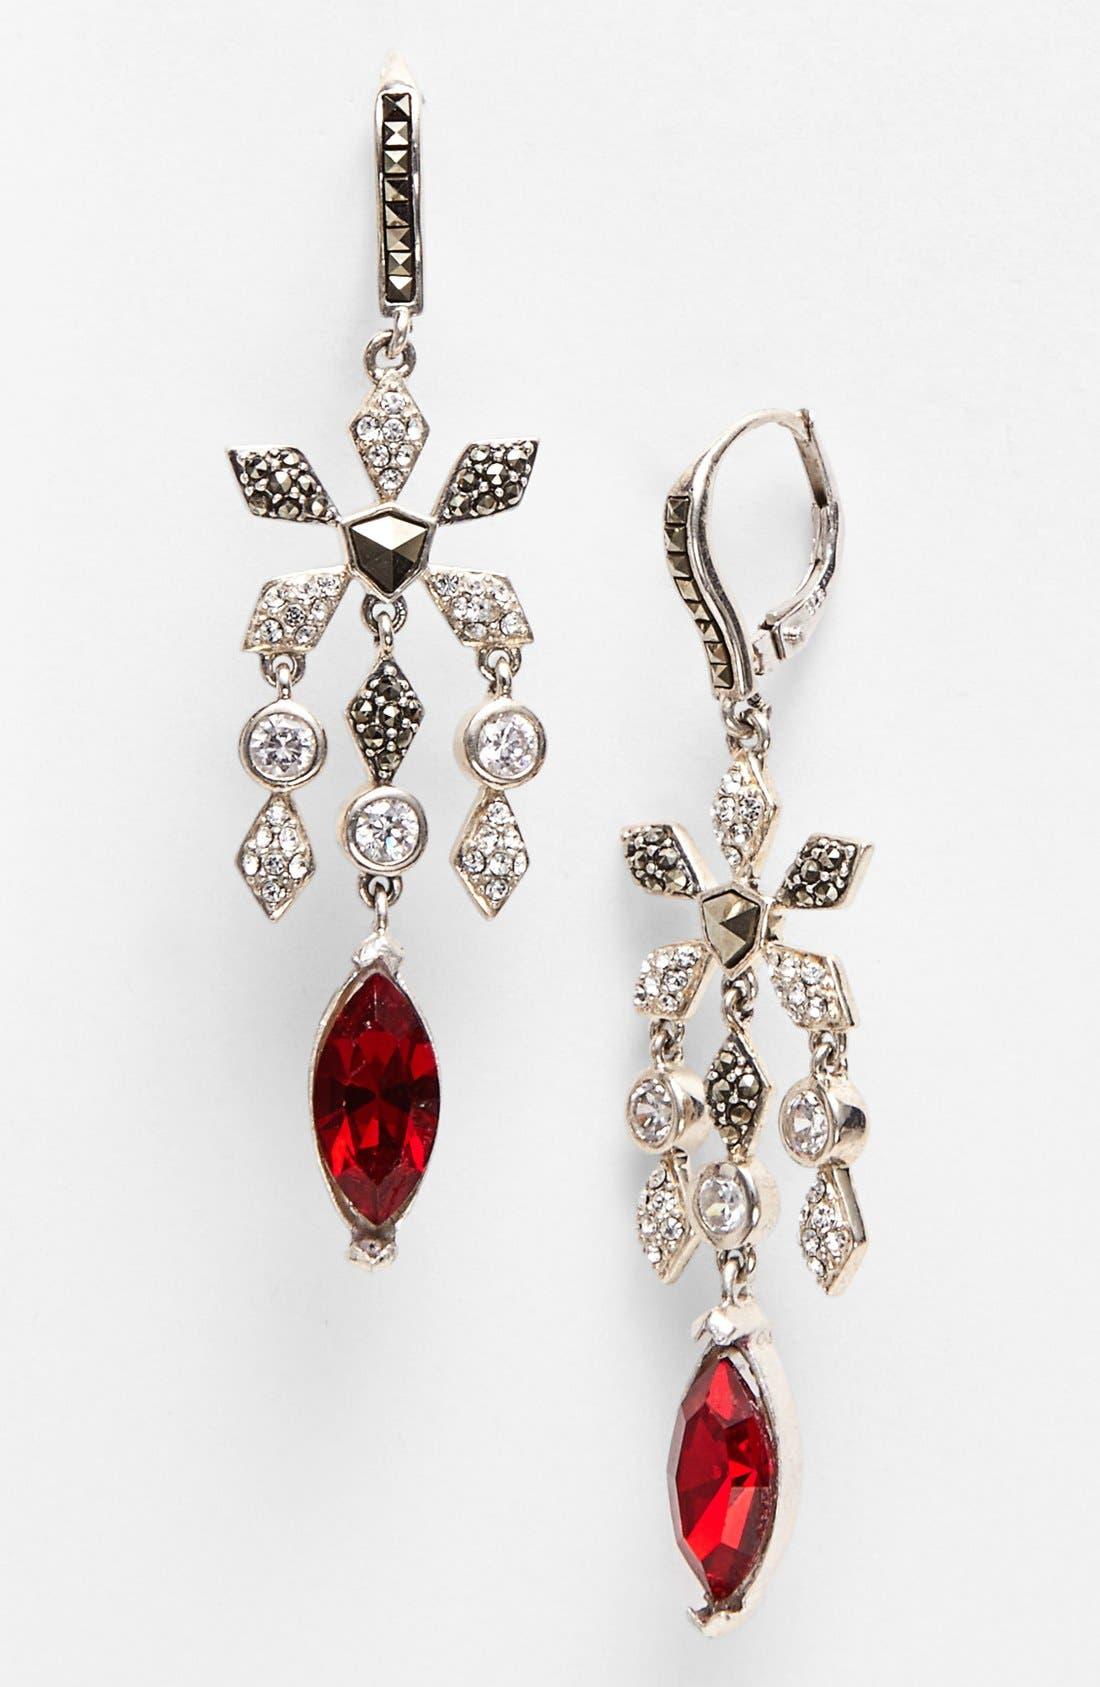 Alternate Image 1 Selected - Judith Jack 'Frosted Glaze' Chandelier Earrings